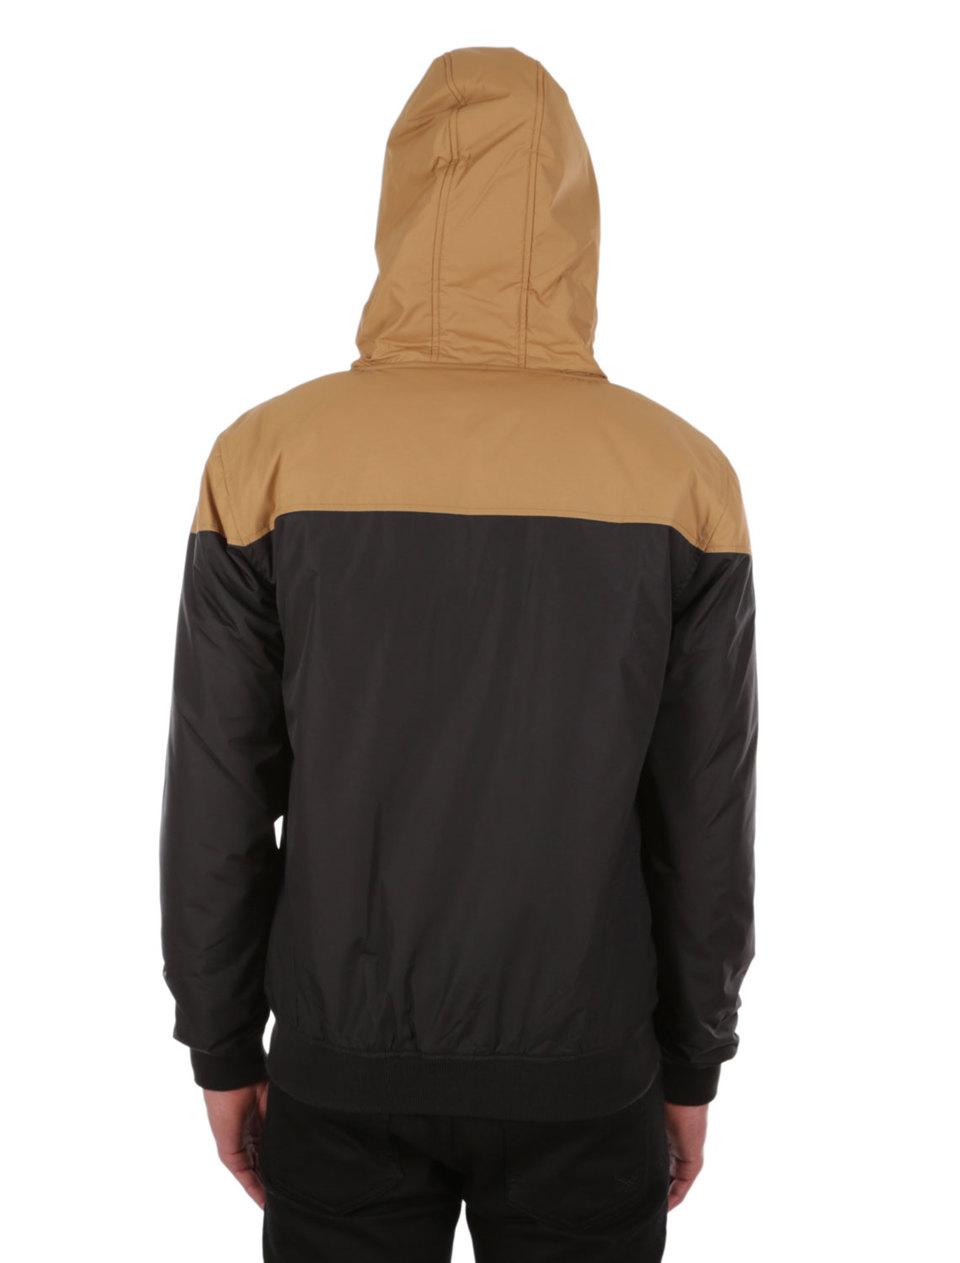 IRIEDAILY   Insulaner Jacket [cara black]   shop official